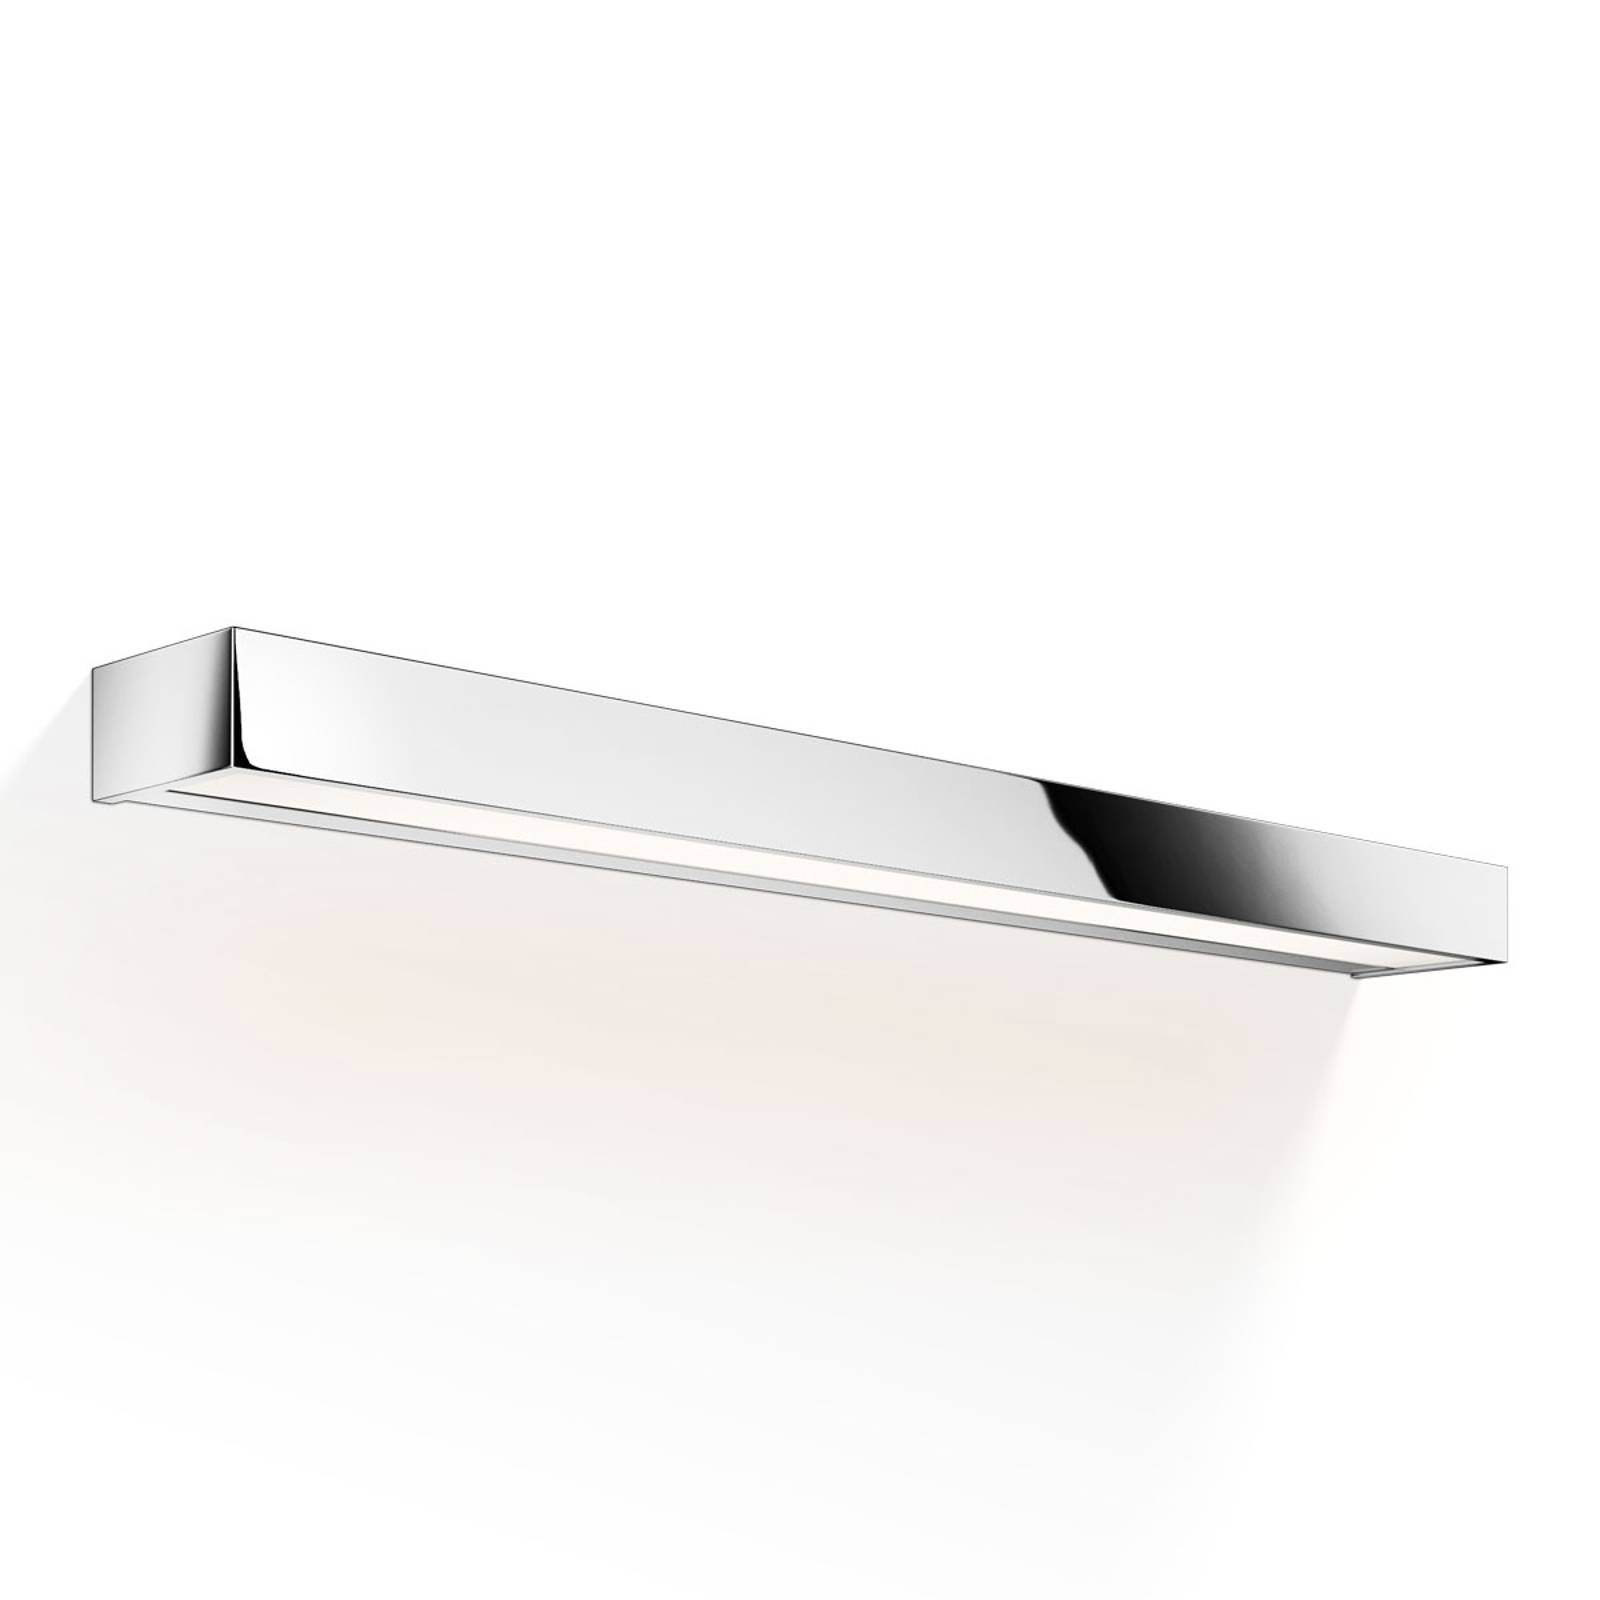 Decor Walther Box 80 N LED wandlamp 2.700 K